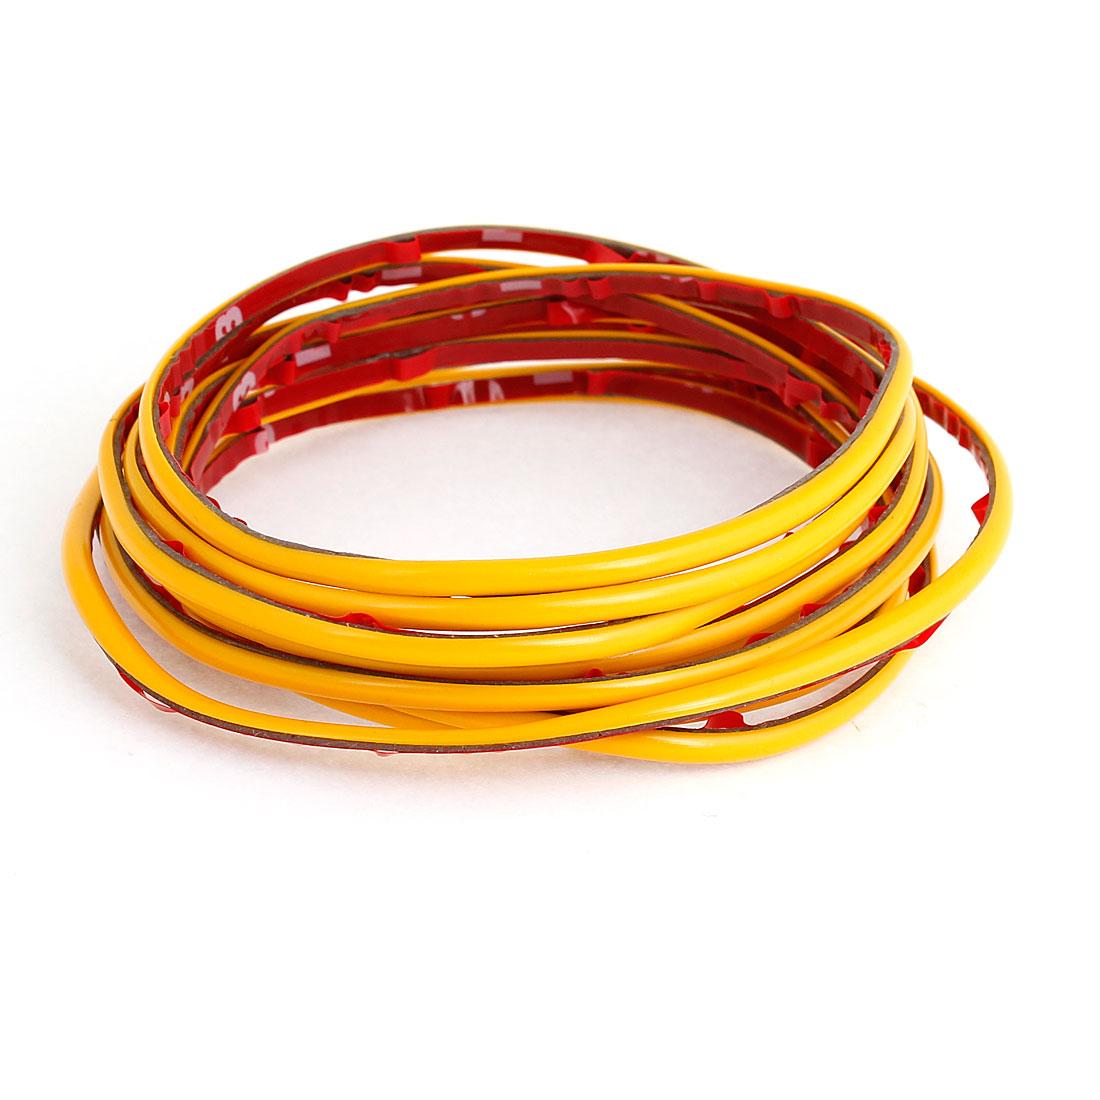 3Meter x 4mm Yellow Flexible Plastic Moulding Trim Strip for Auto Car